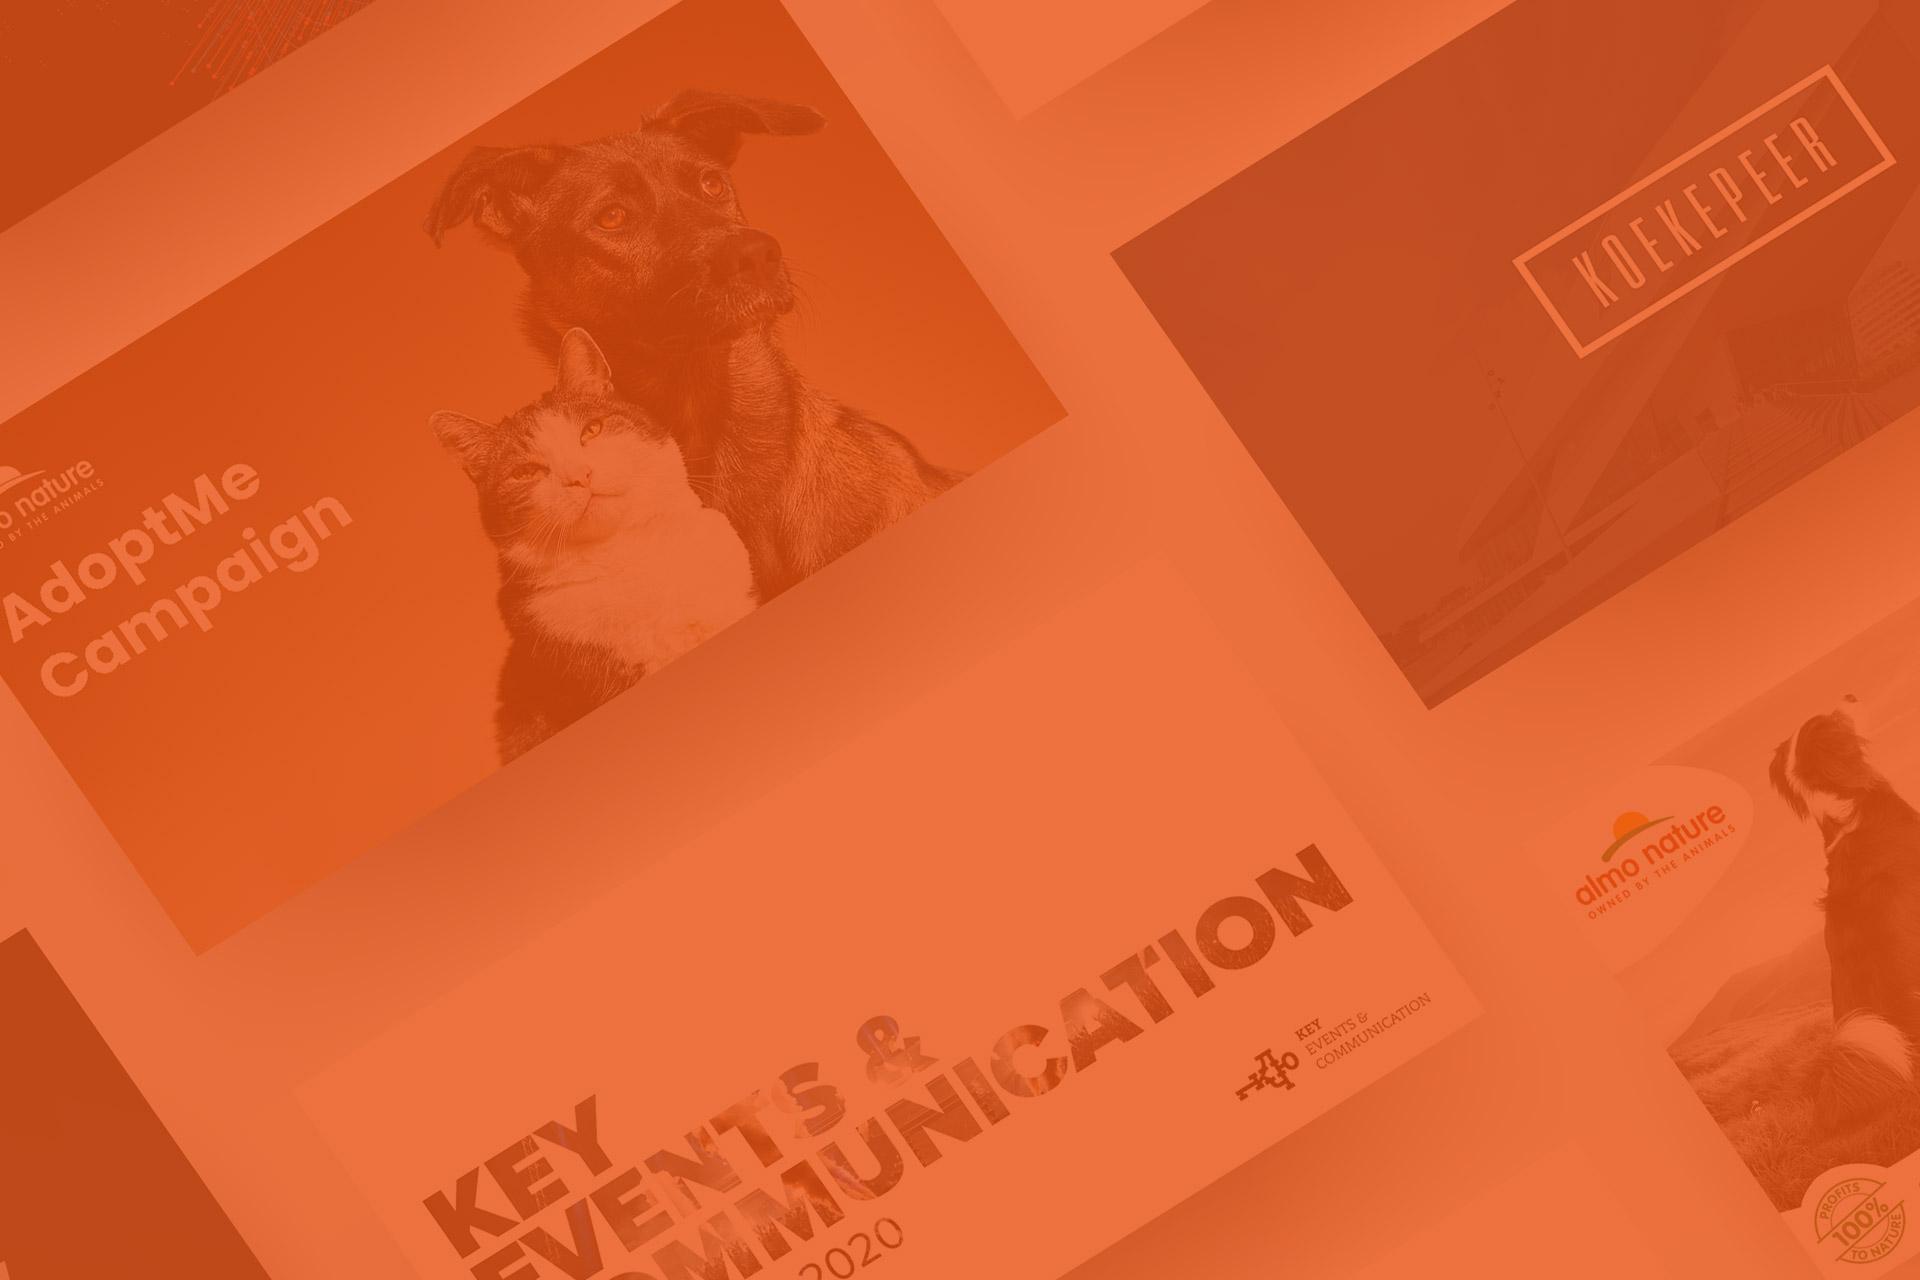 milen galabov corporate communication materials